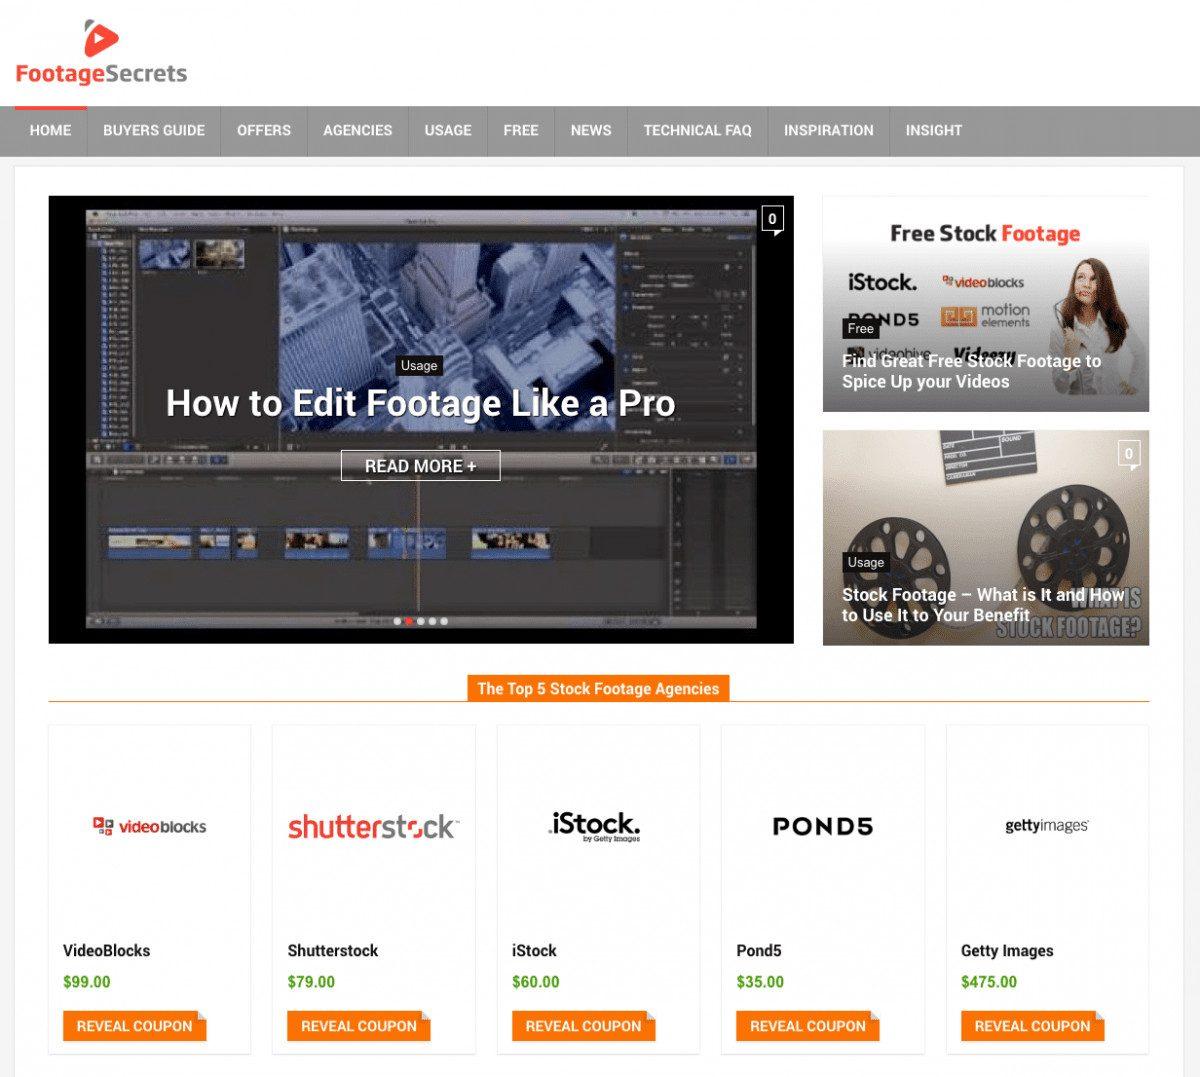 Footage Secrets Homepage